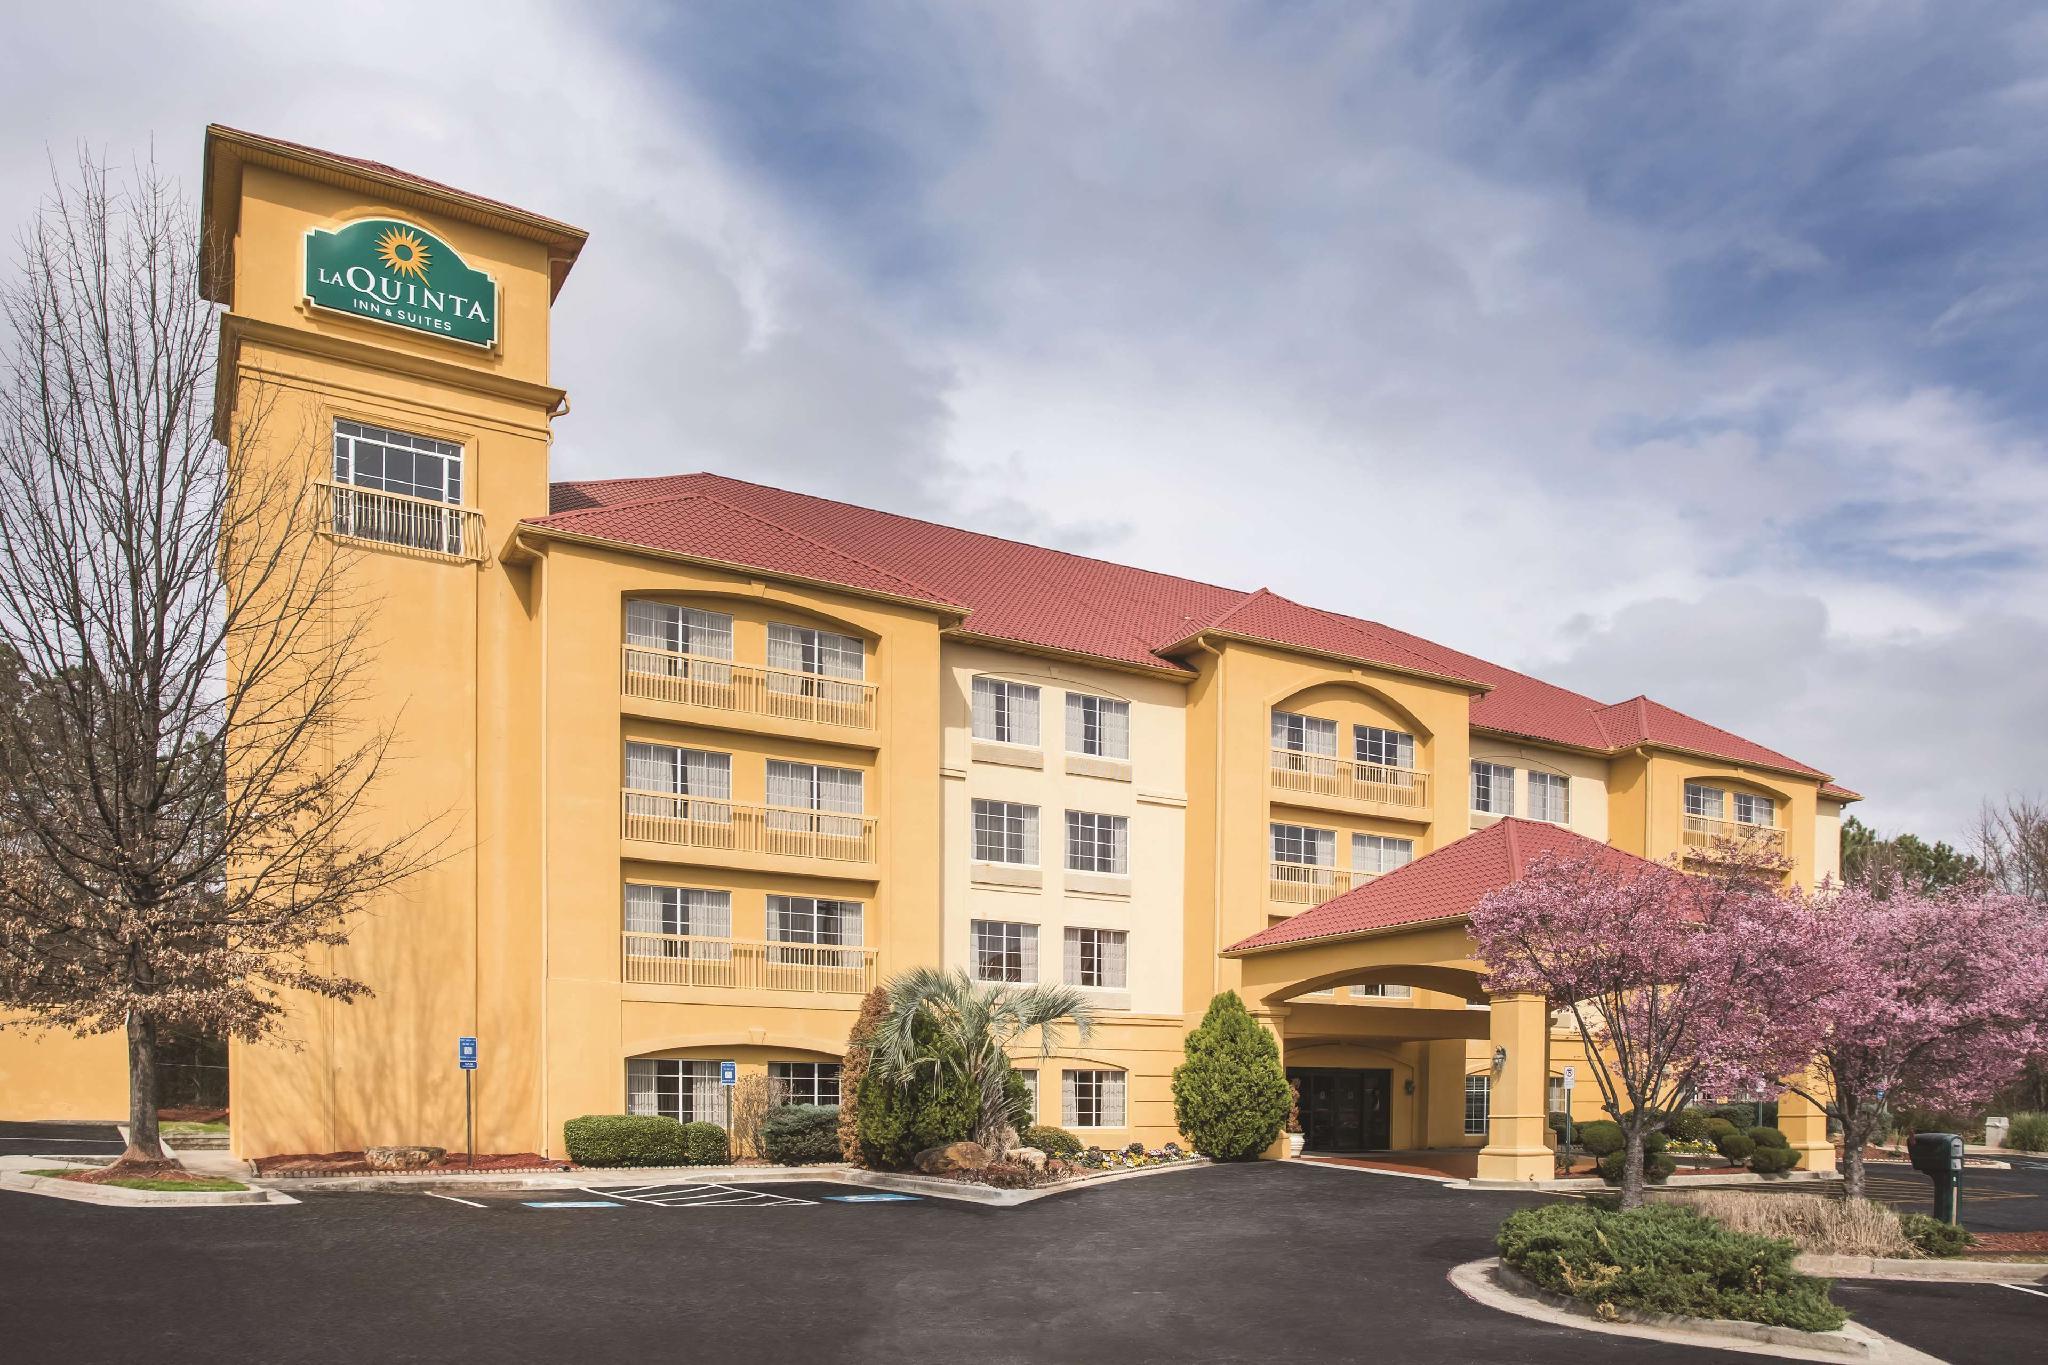 La Quinta Inn And Suites By Wyndham Atlanta Stockbridge